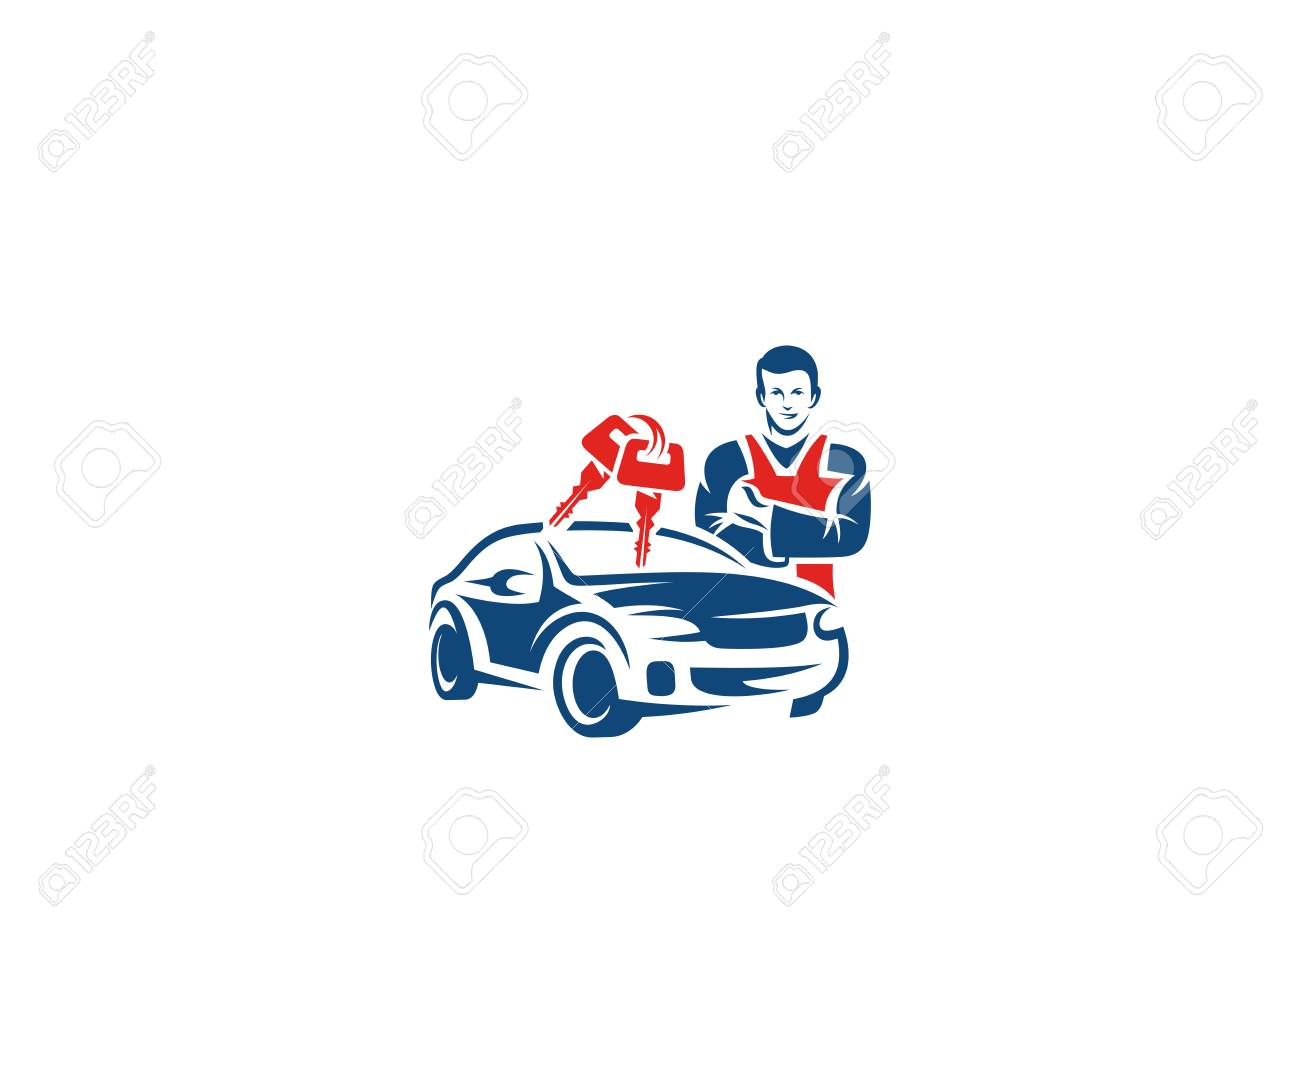 Car Key Service Logo Template Auto Key Locksmith Vector Design Royalty Free Cliparts Vectors And Stock Illustration Image 94457583